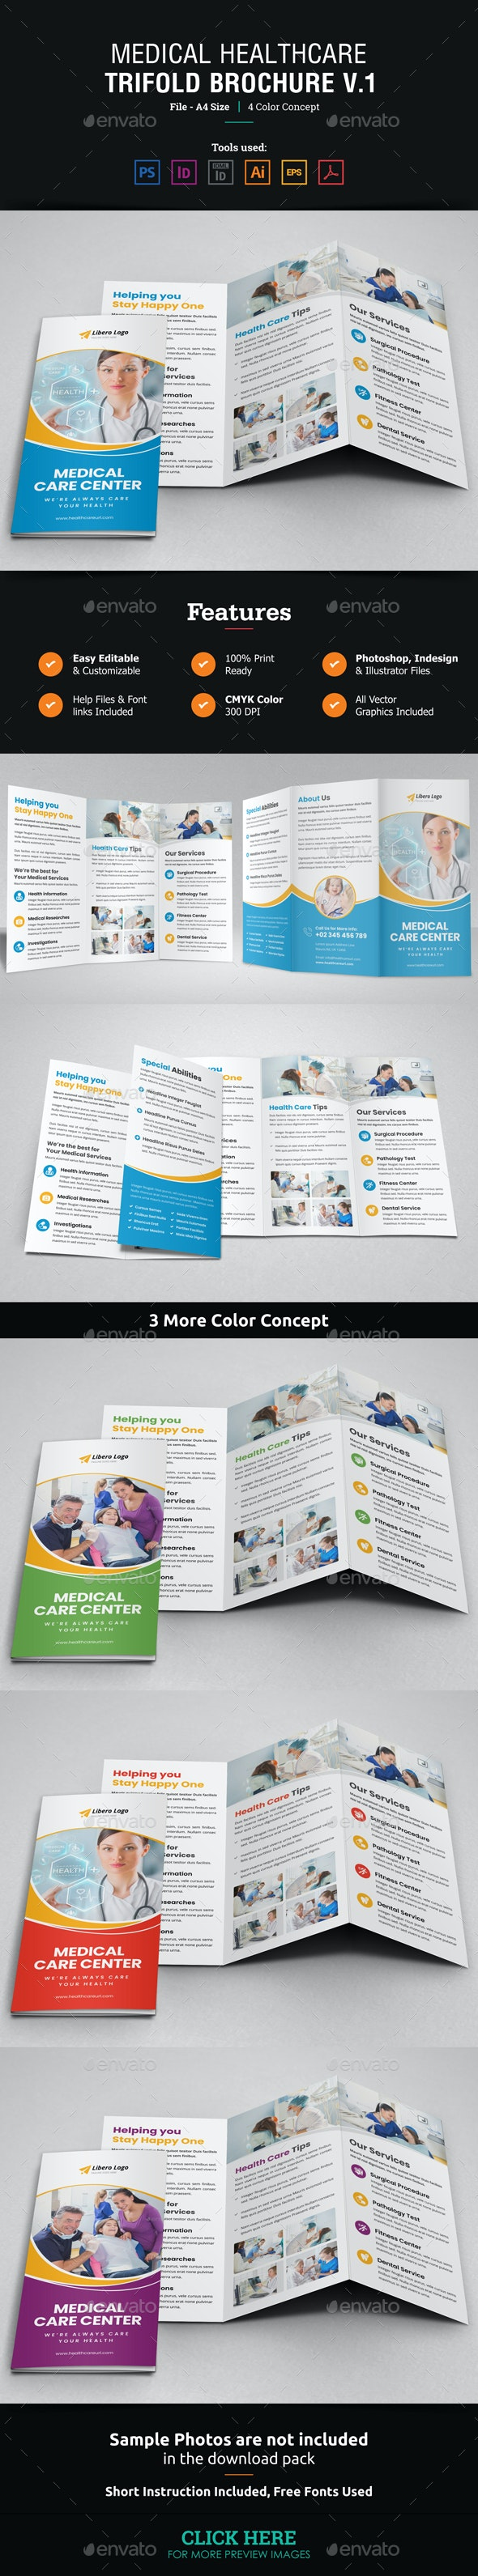 Medical Healthcare Trifold Brochure v1 - Corporate Brochures